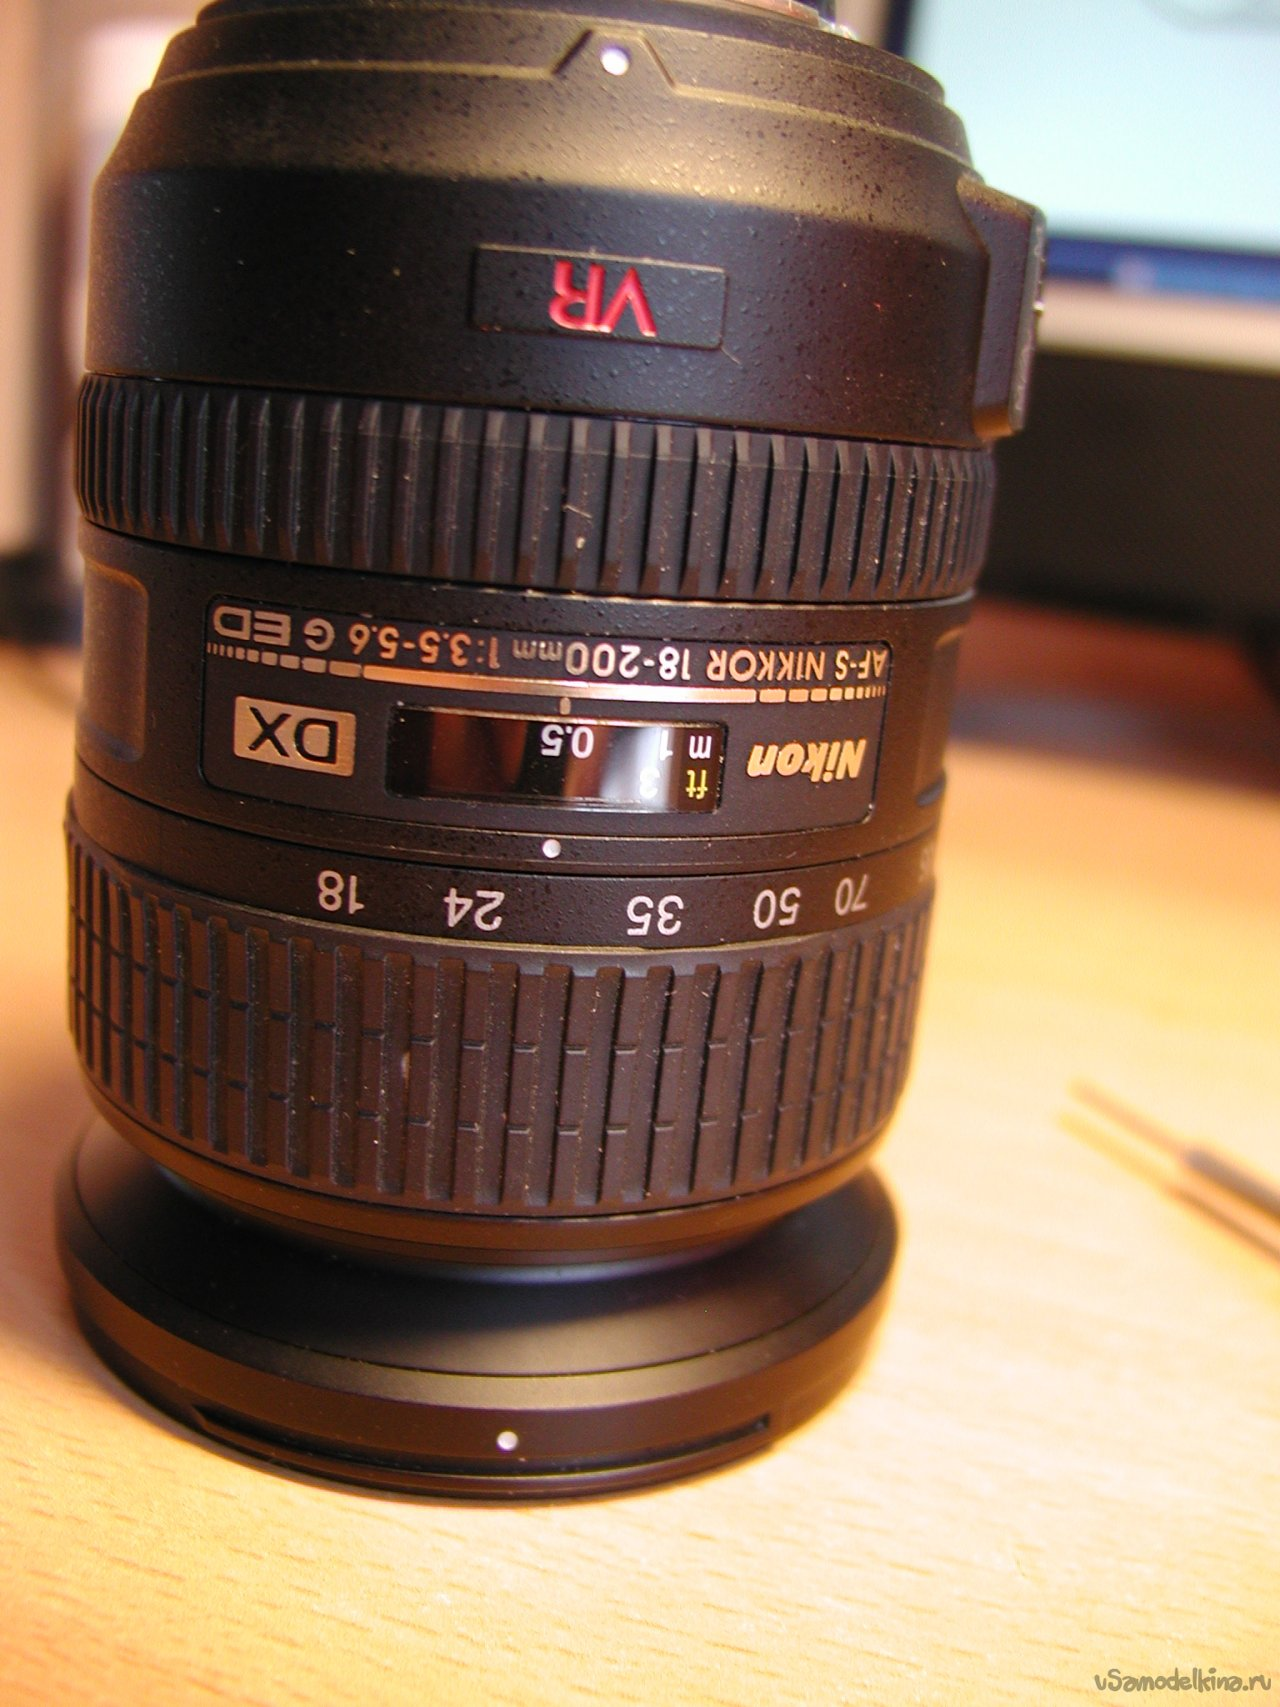 Lens repair Nikon DX AF-S Nikkor 18-200mm 1: 3.5-5.6G ED SWM VR IF Aspherical